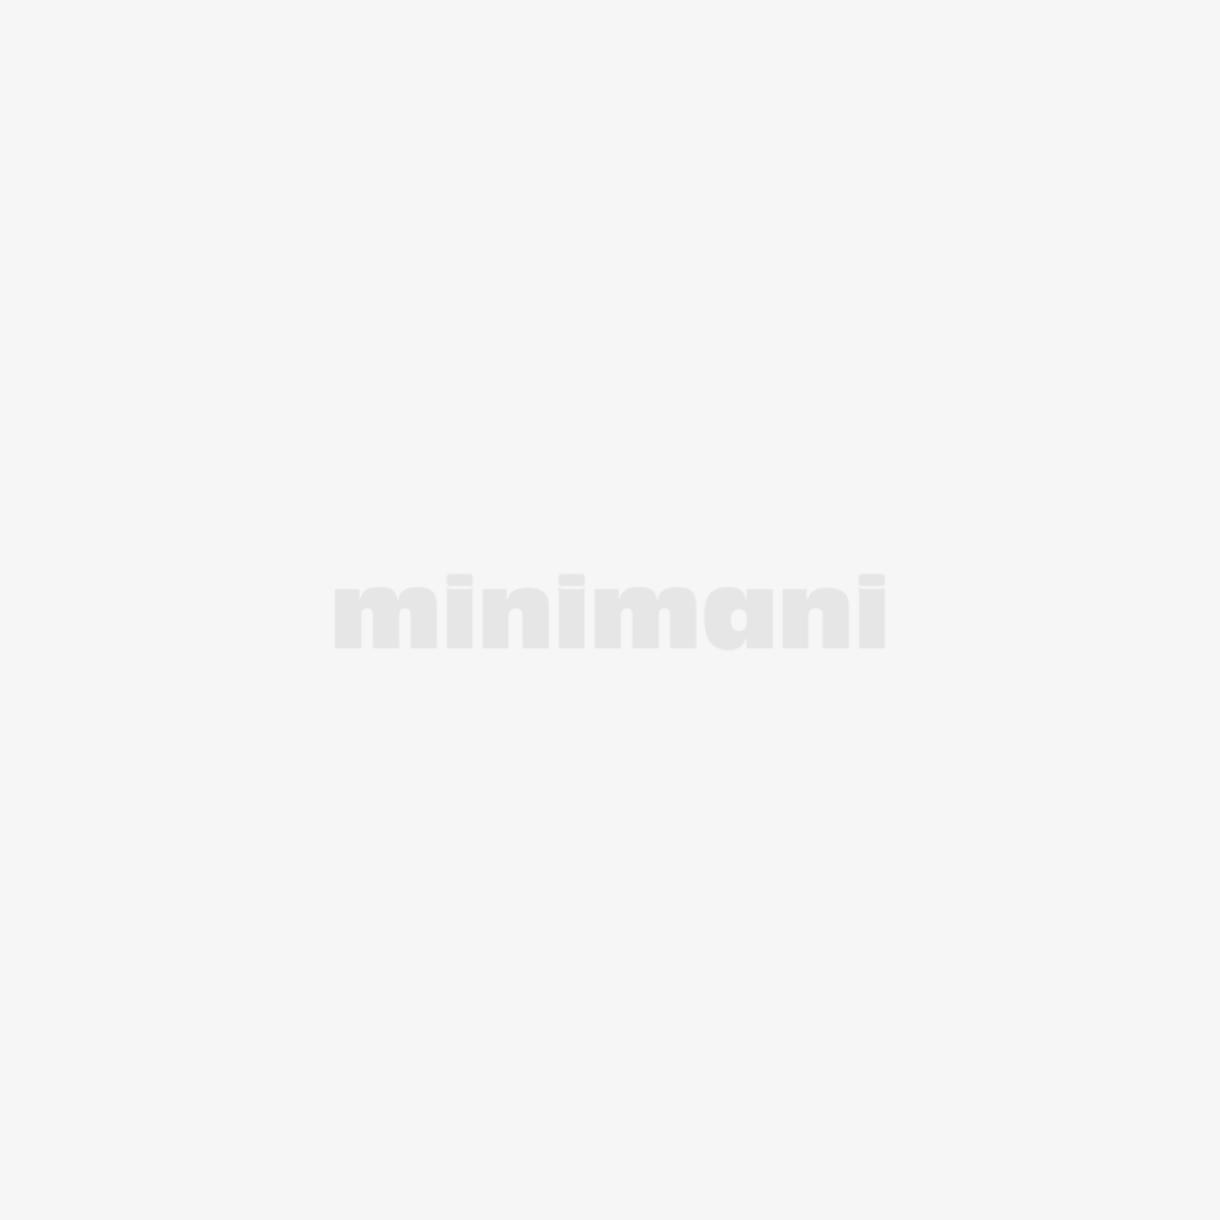 M-FILTER ILMANSUODATIN  MAP 6884 ESCORT 1.6 CVH 8/90-